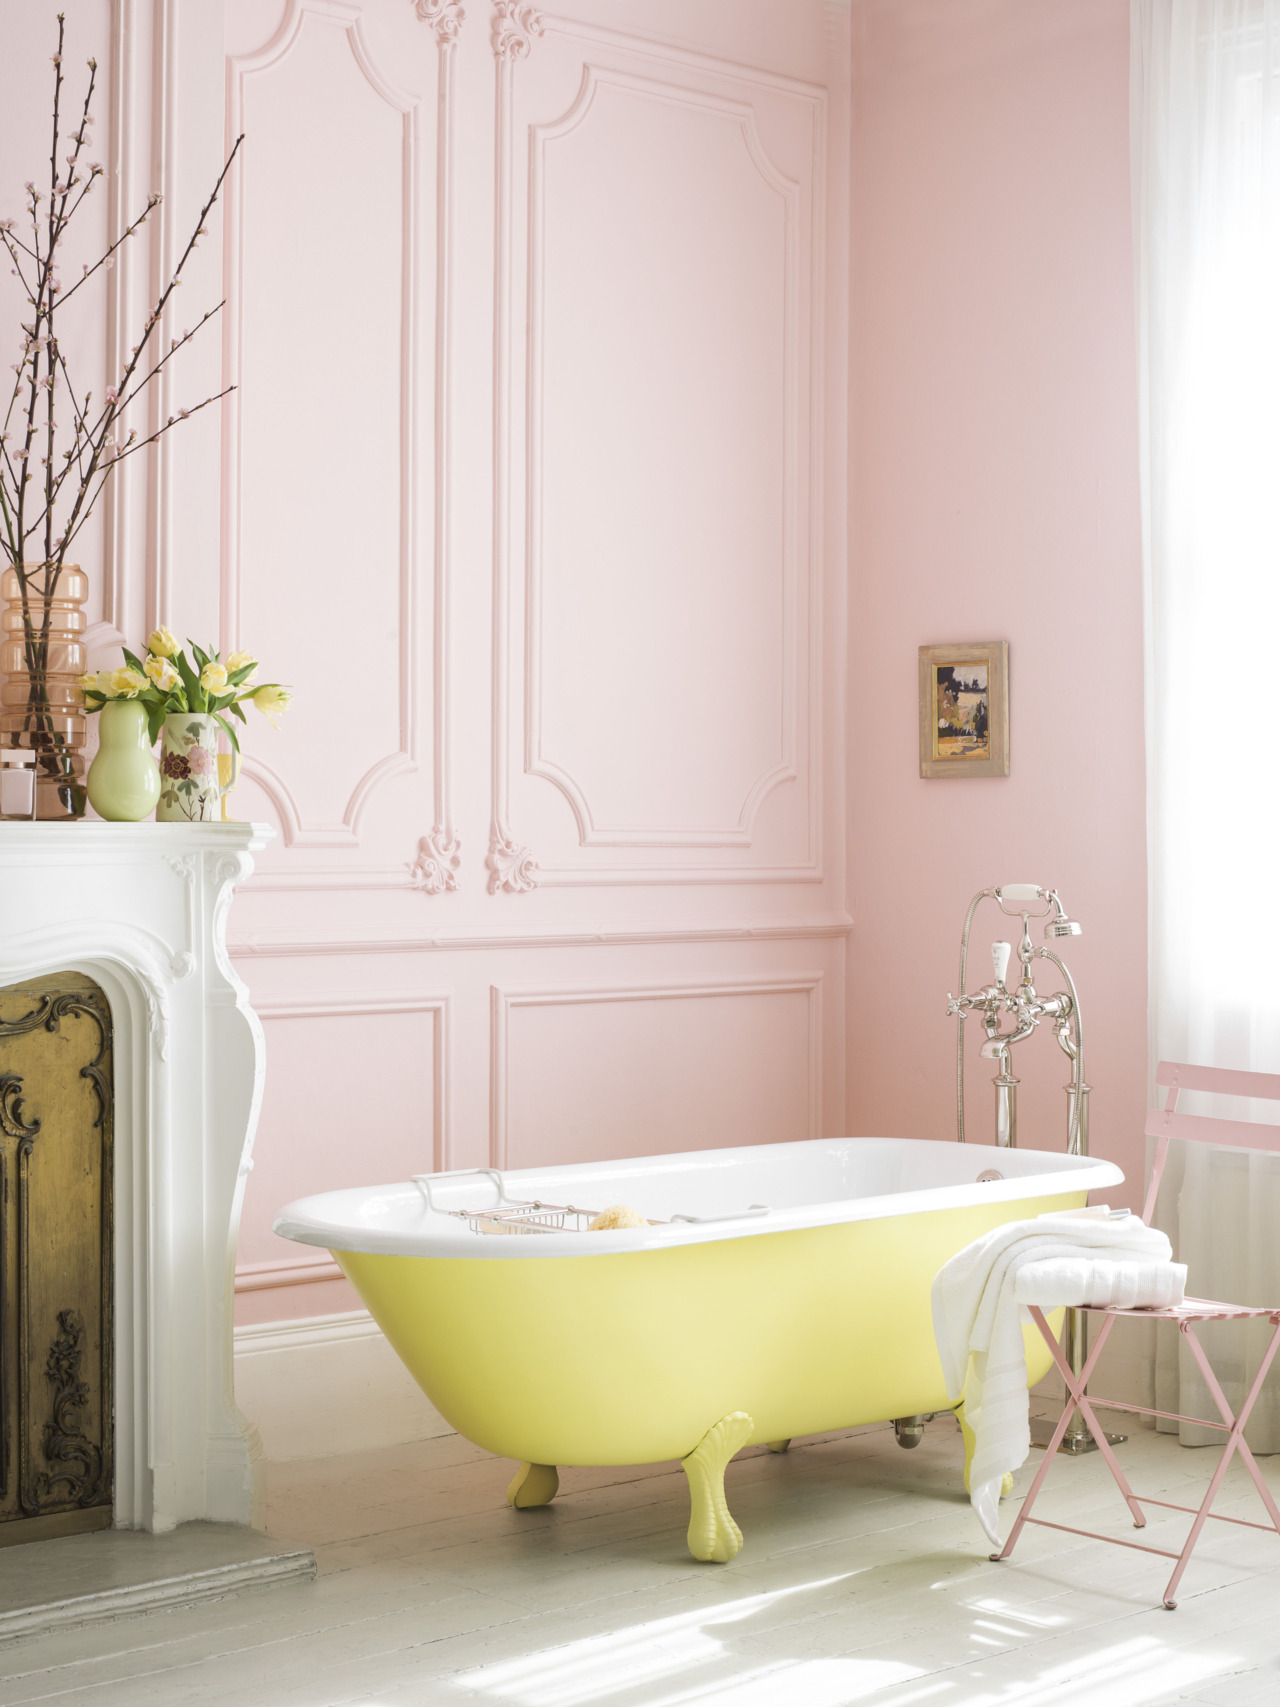 Pink Bathroom With Yellow Tub